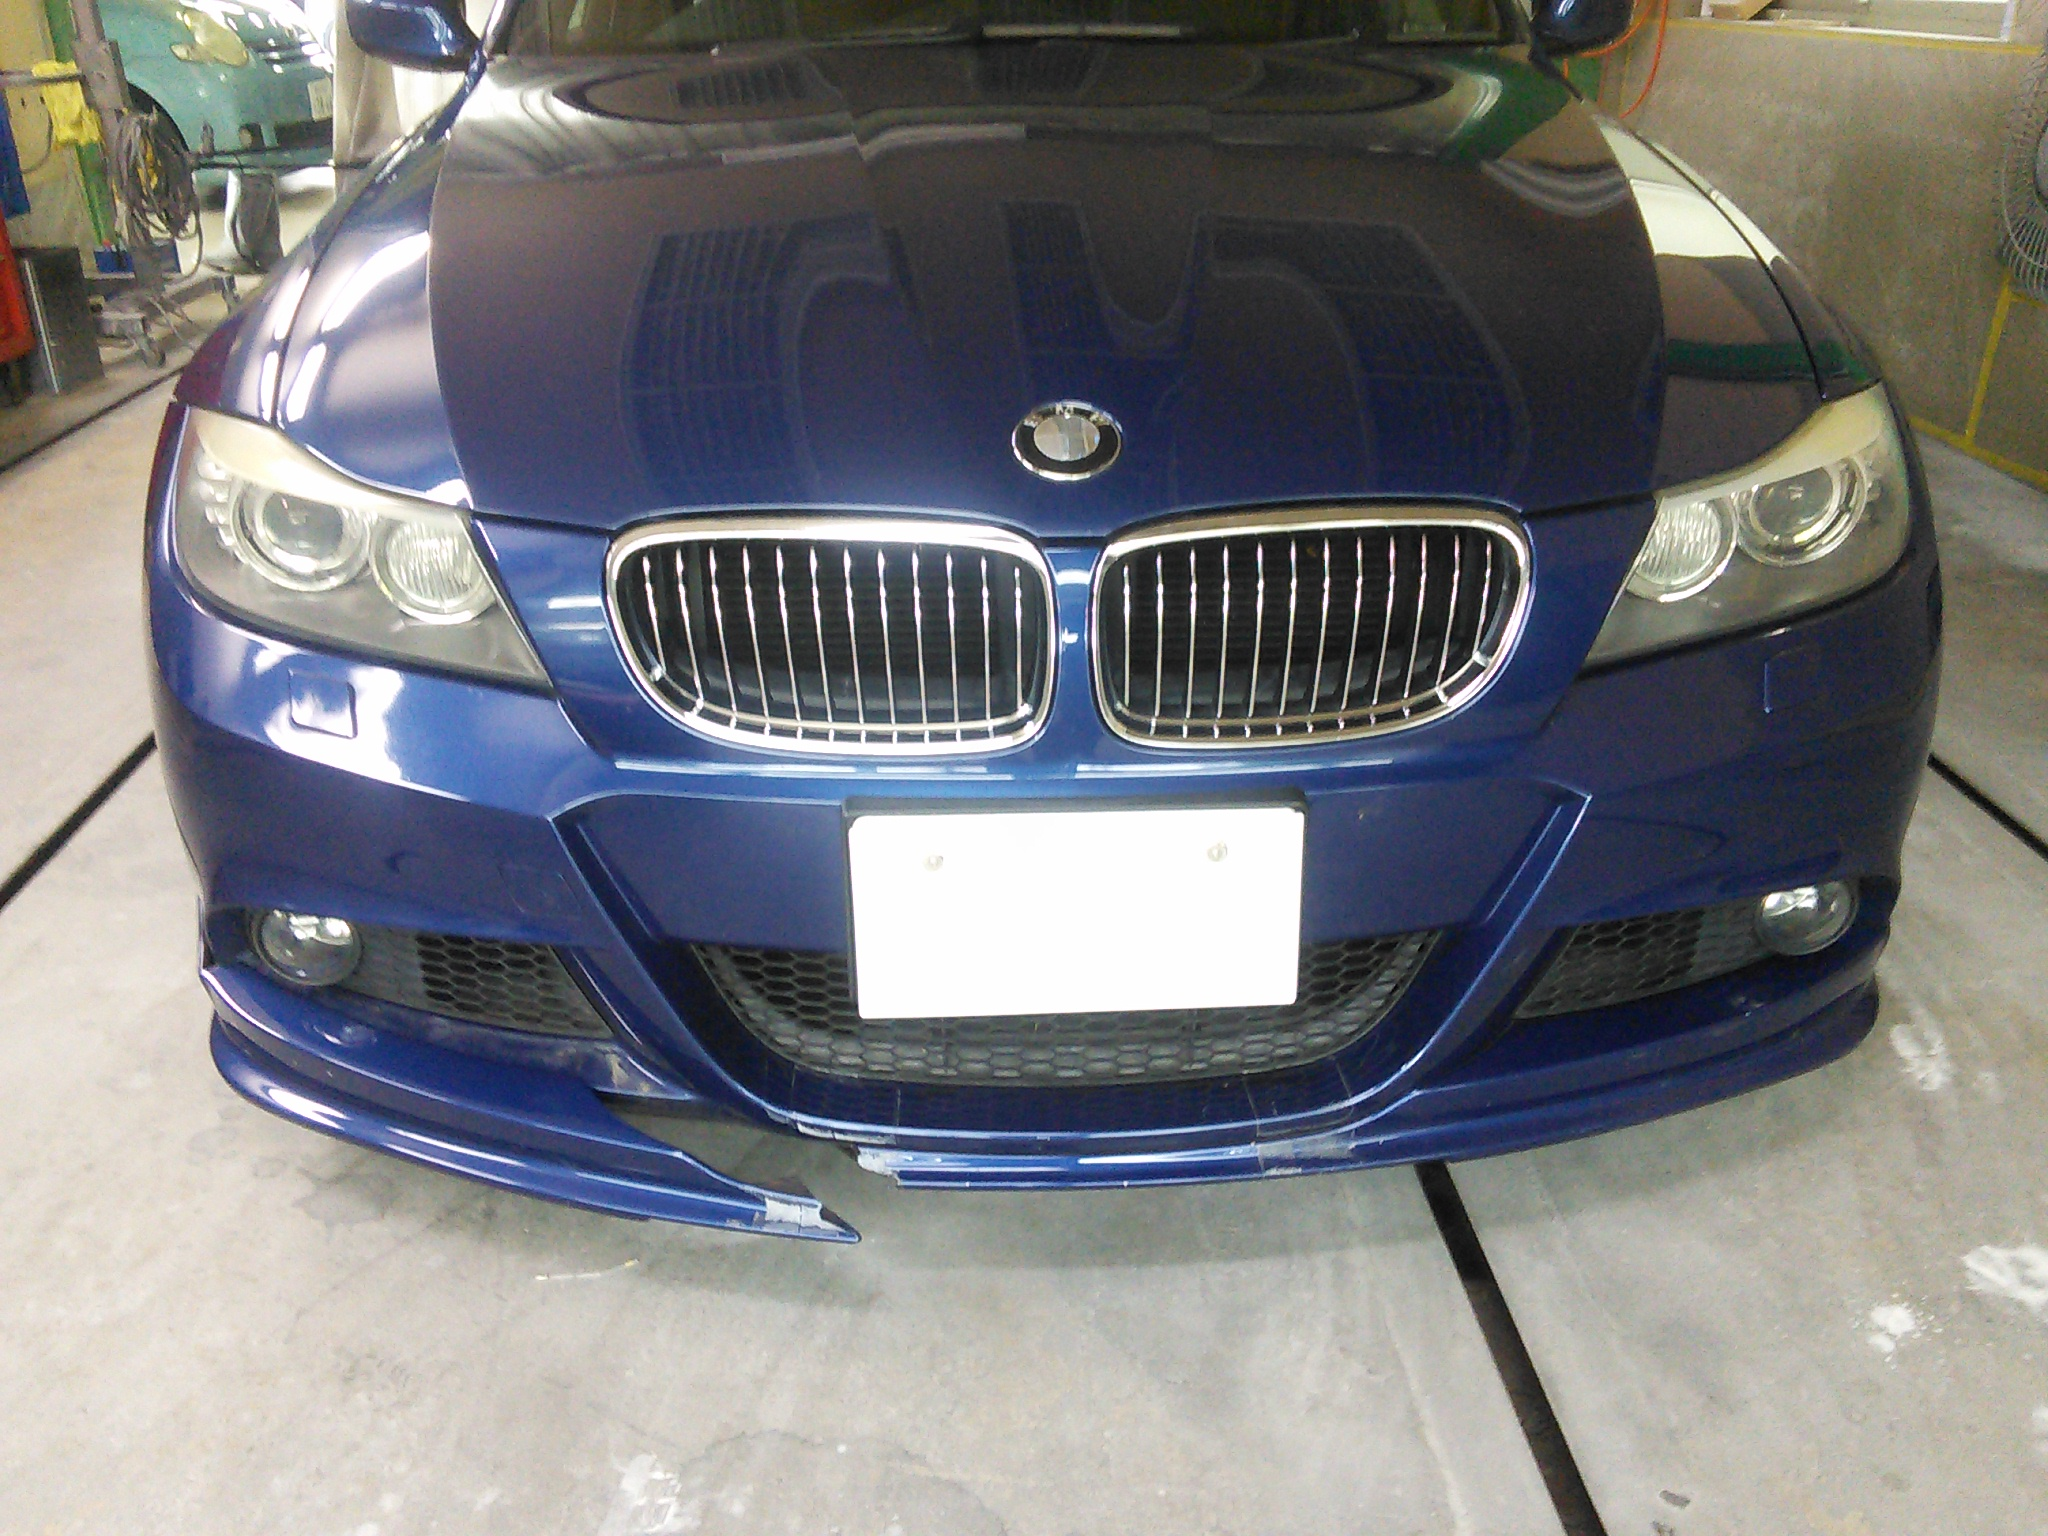 BMW 335 社外品 フロントバンパースポイラー直るかな? 豊田市  板金塗装